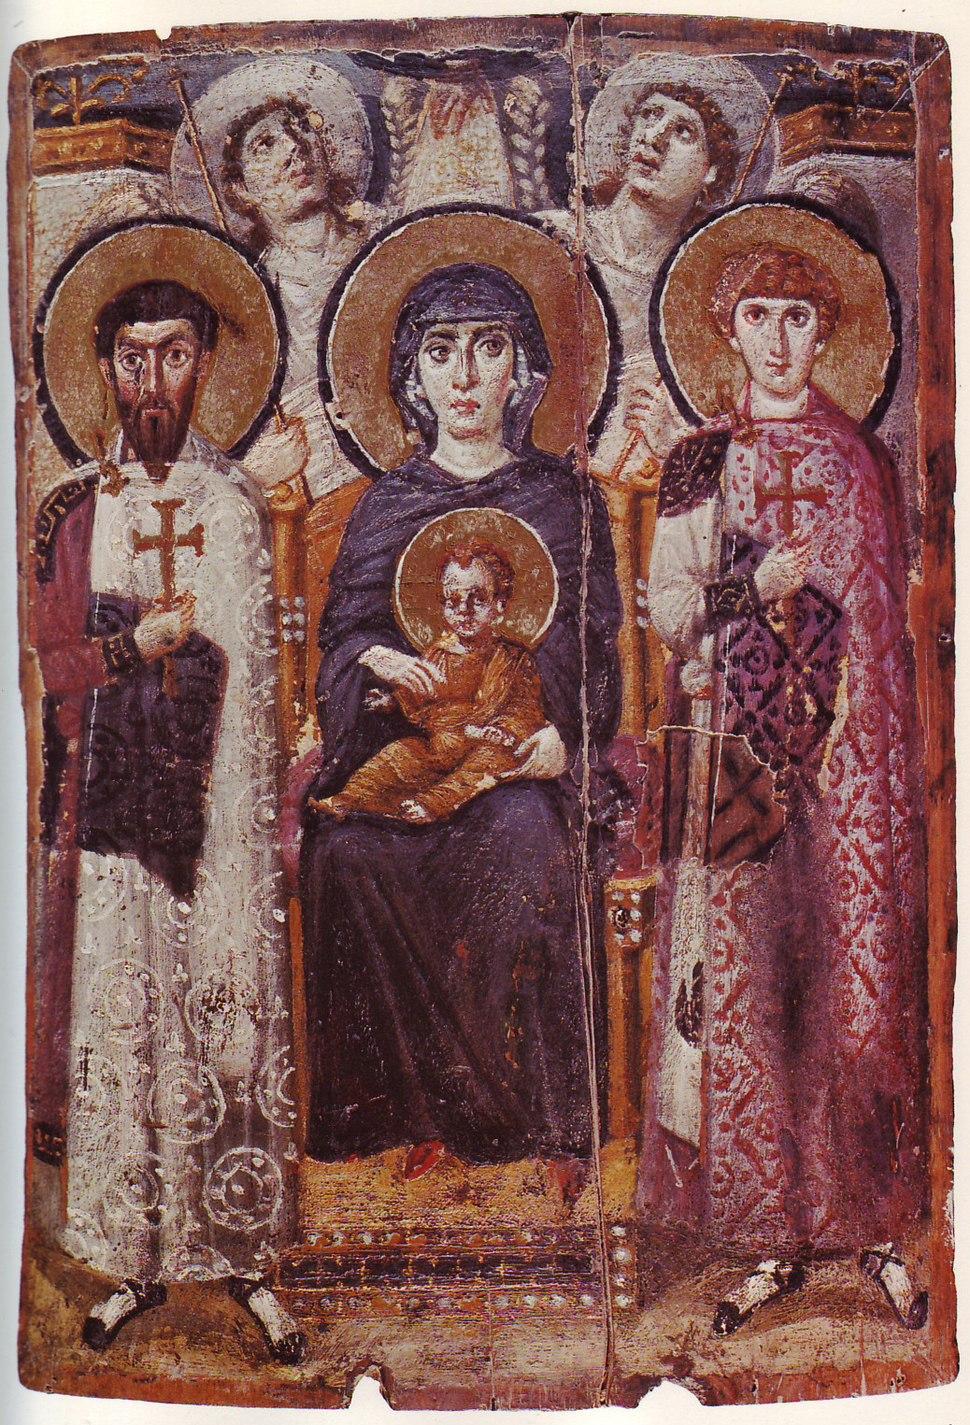 Mary & Child Icon Sinai 6th century